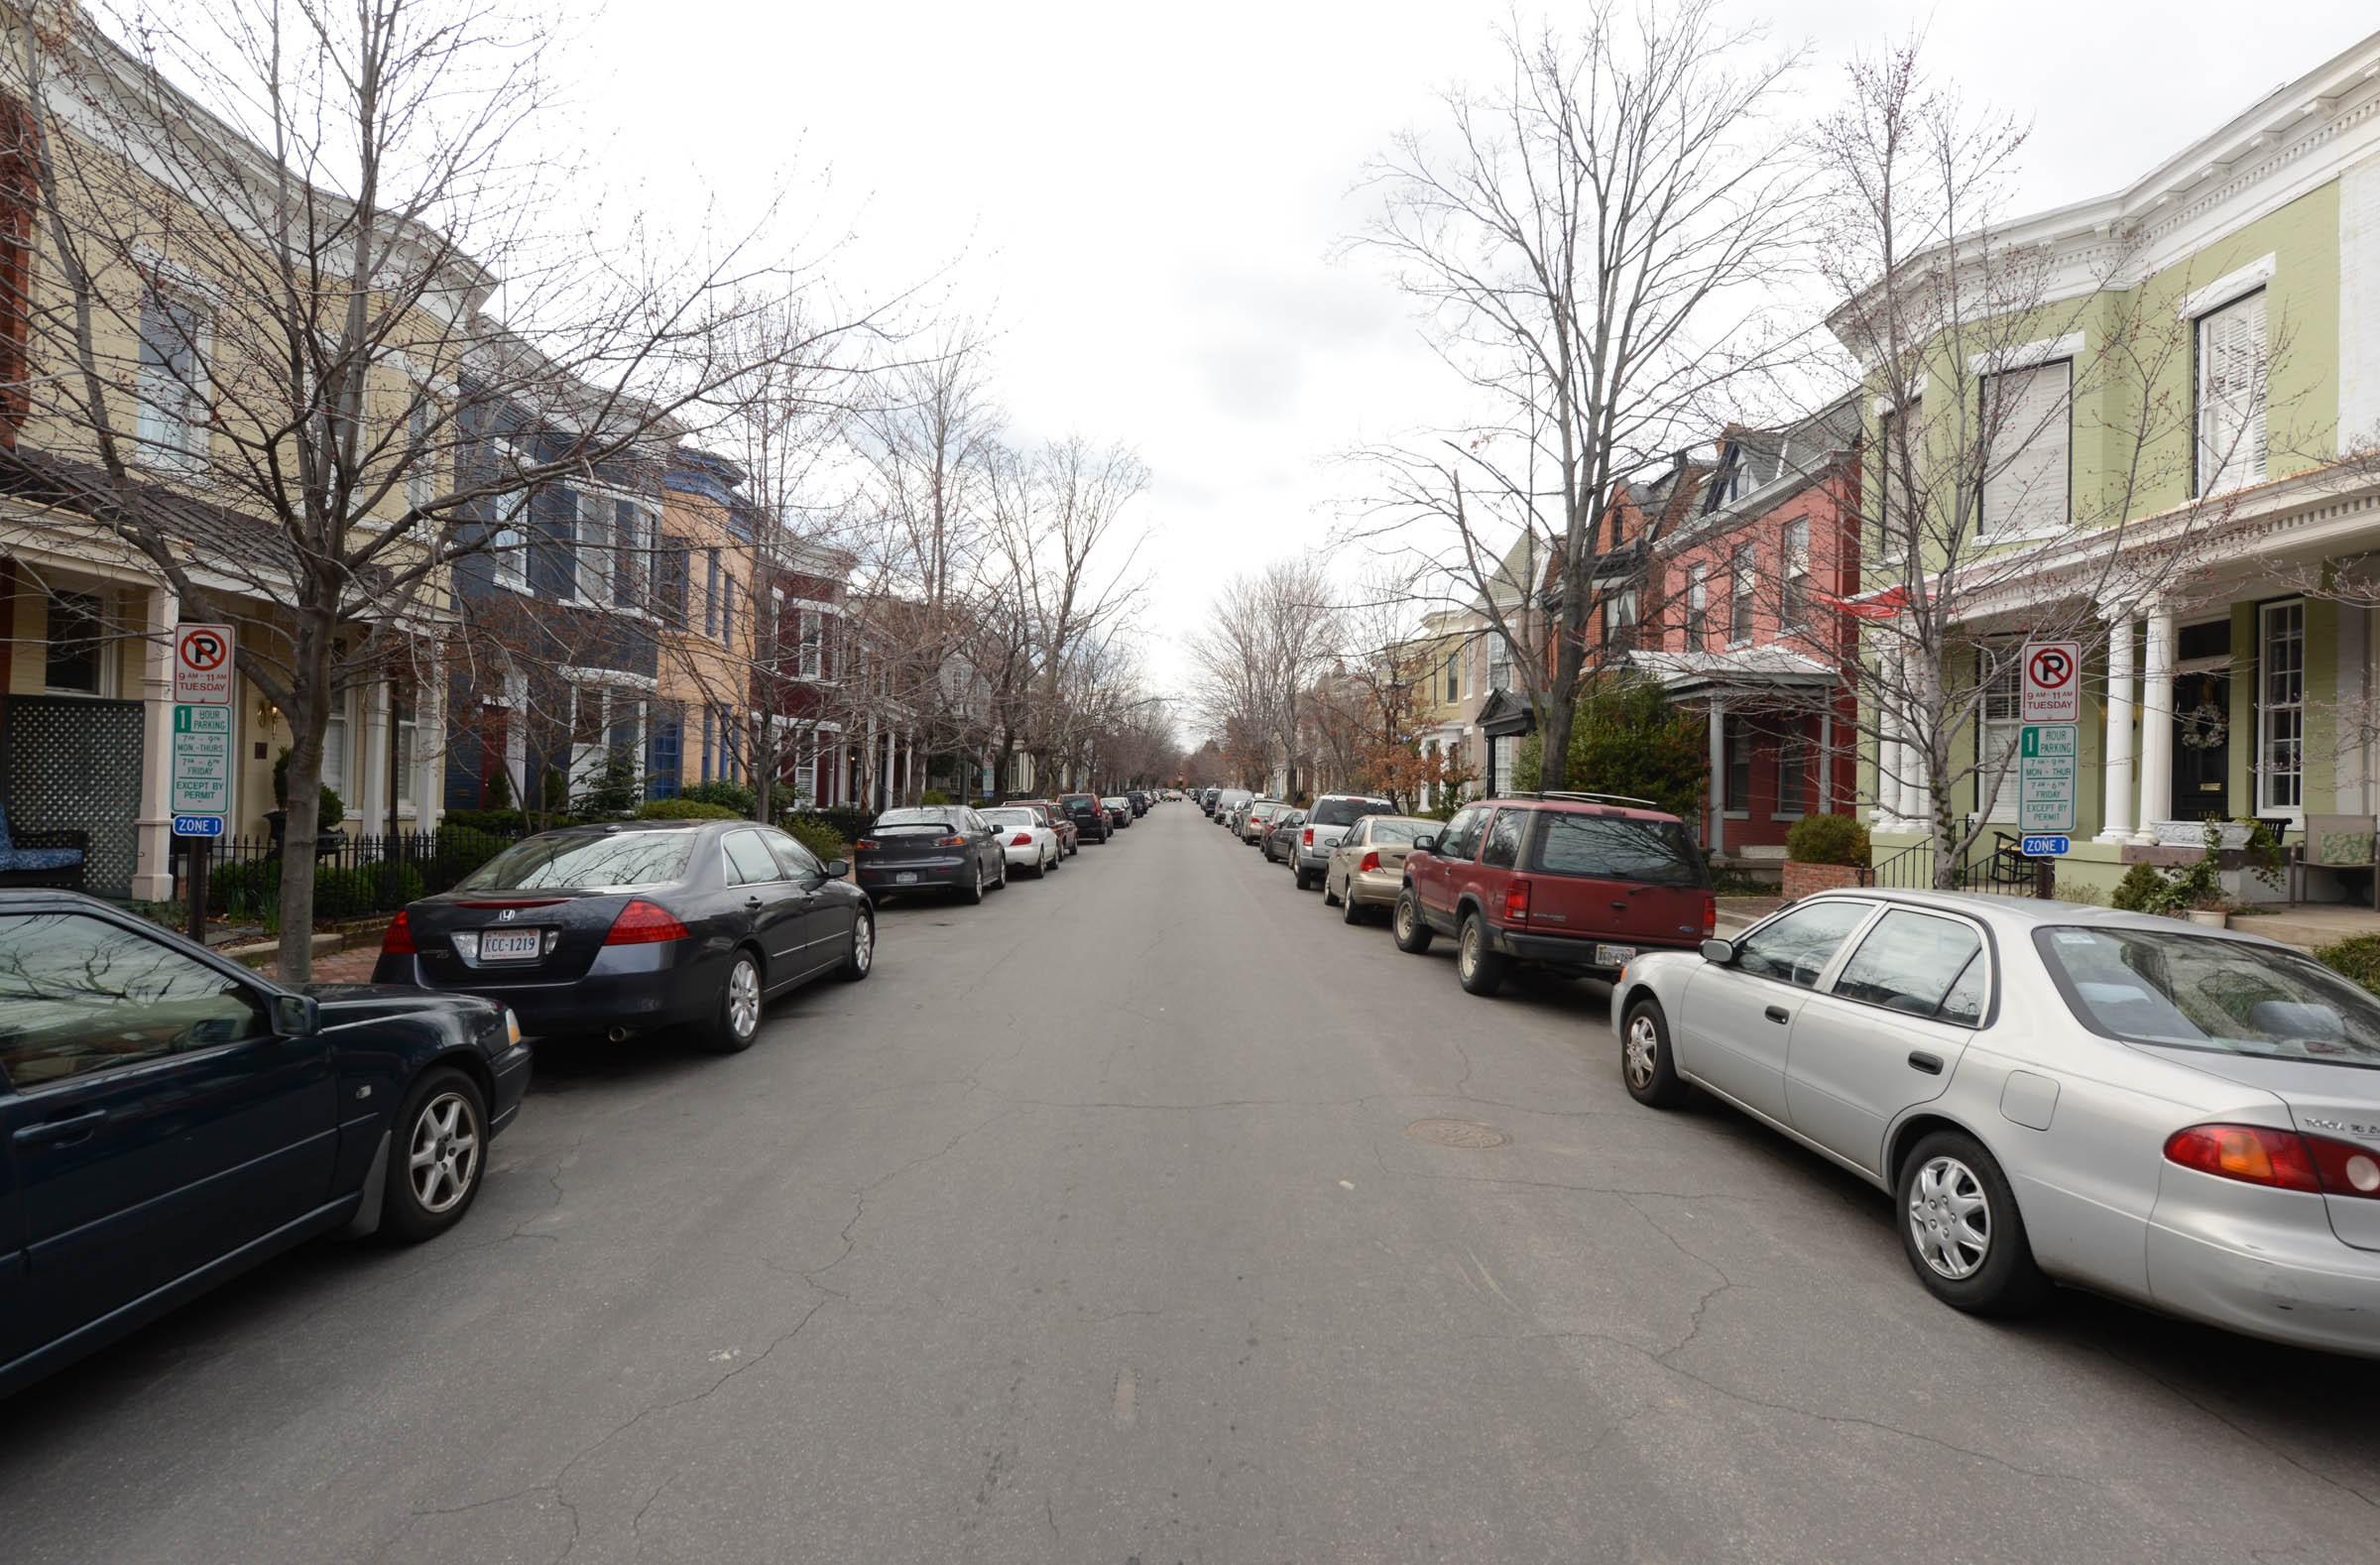 West Avenue is the site of a pilot program that extends parking restrictions for nonresidents. - SCOTT ELMQUIST